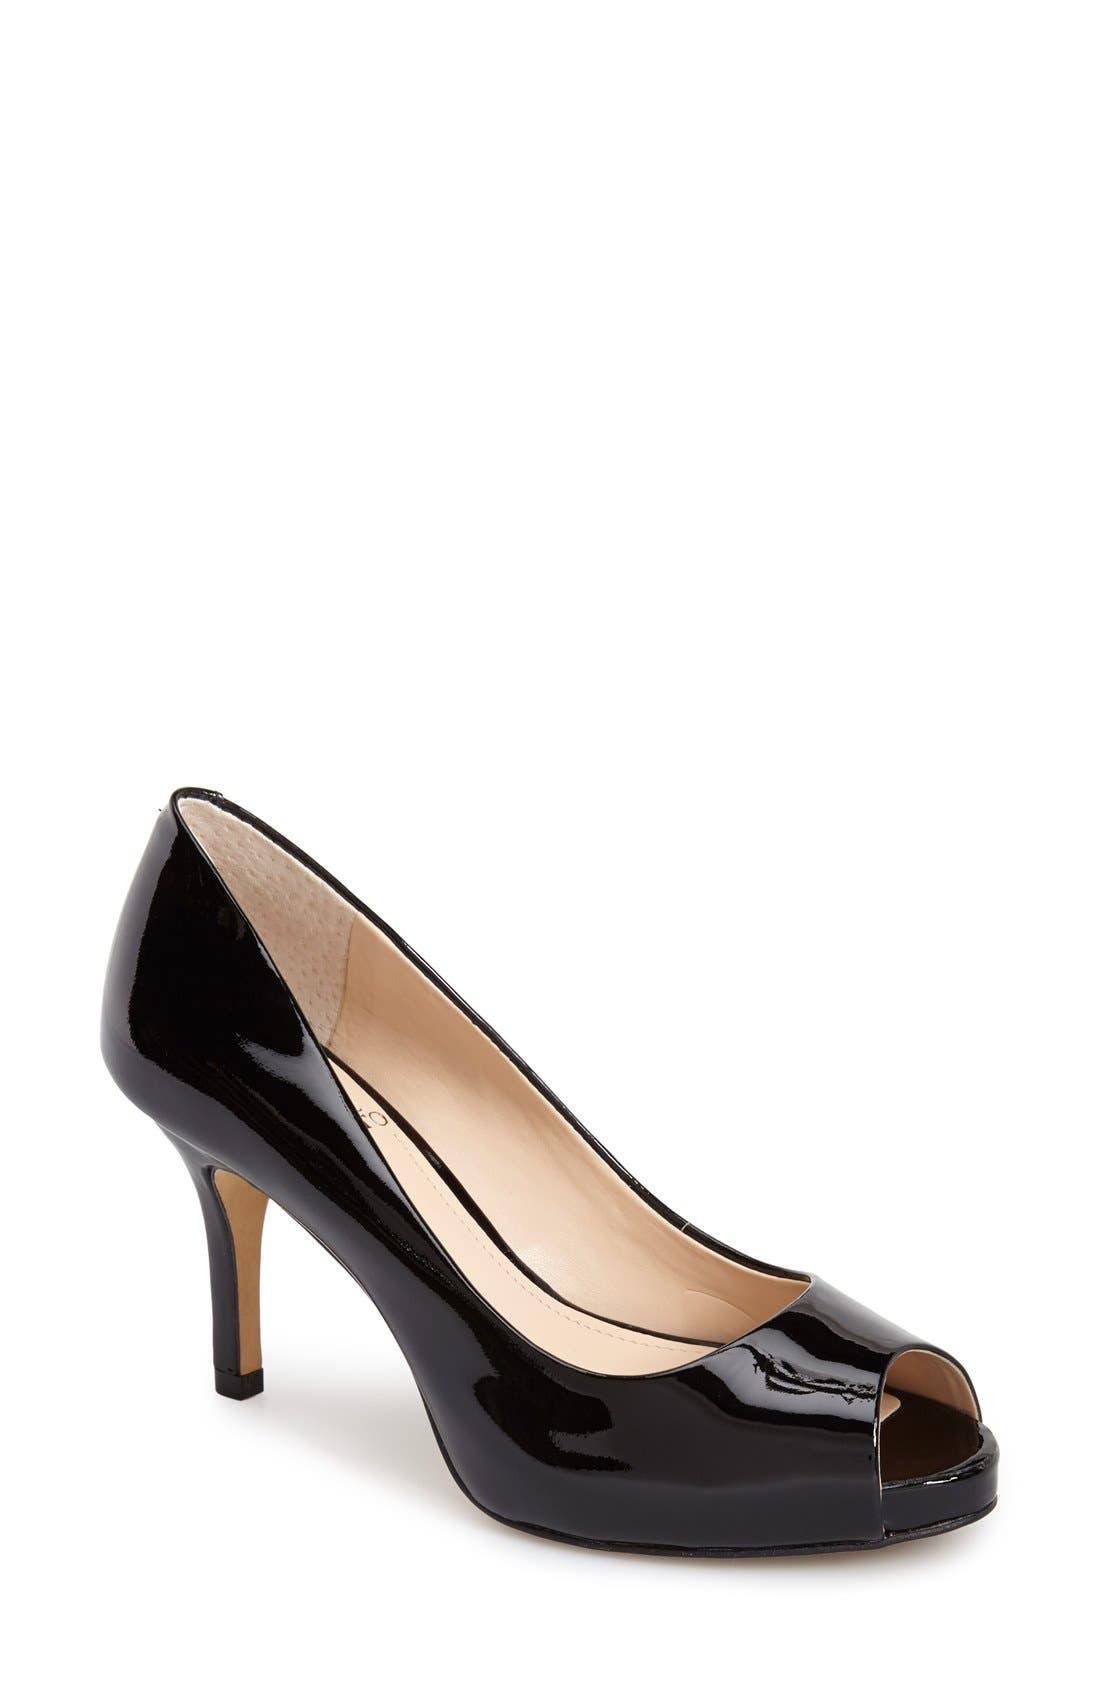 Main Image - Vince Camuto 'Kiley' Peep Toe Platform Pump (Women)